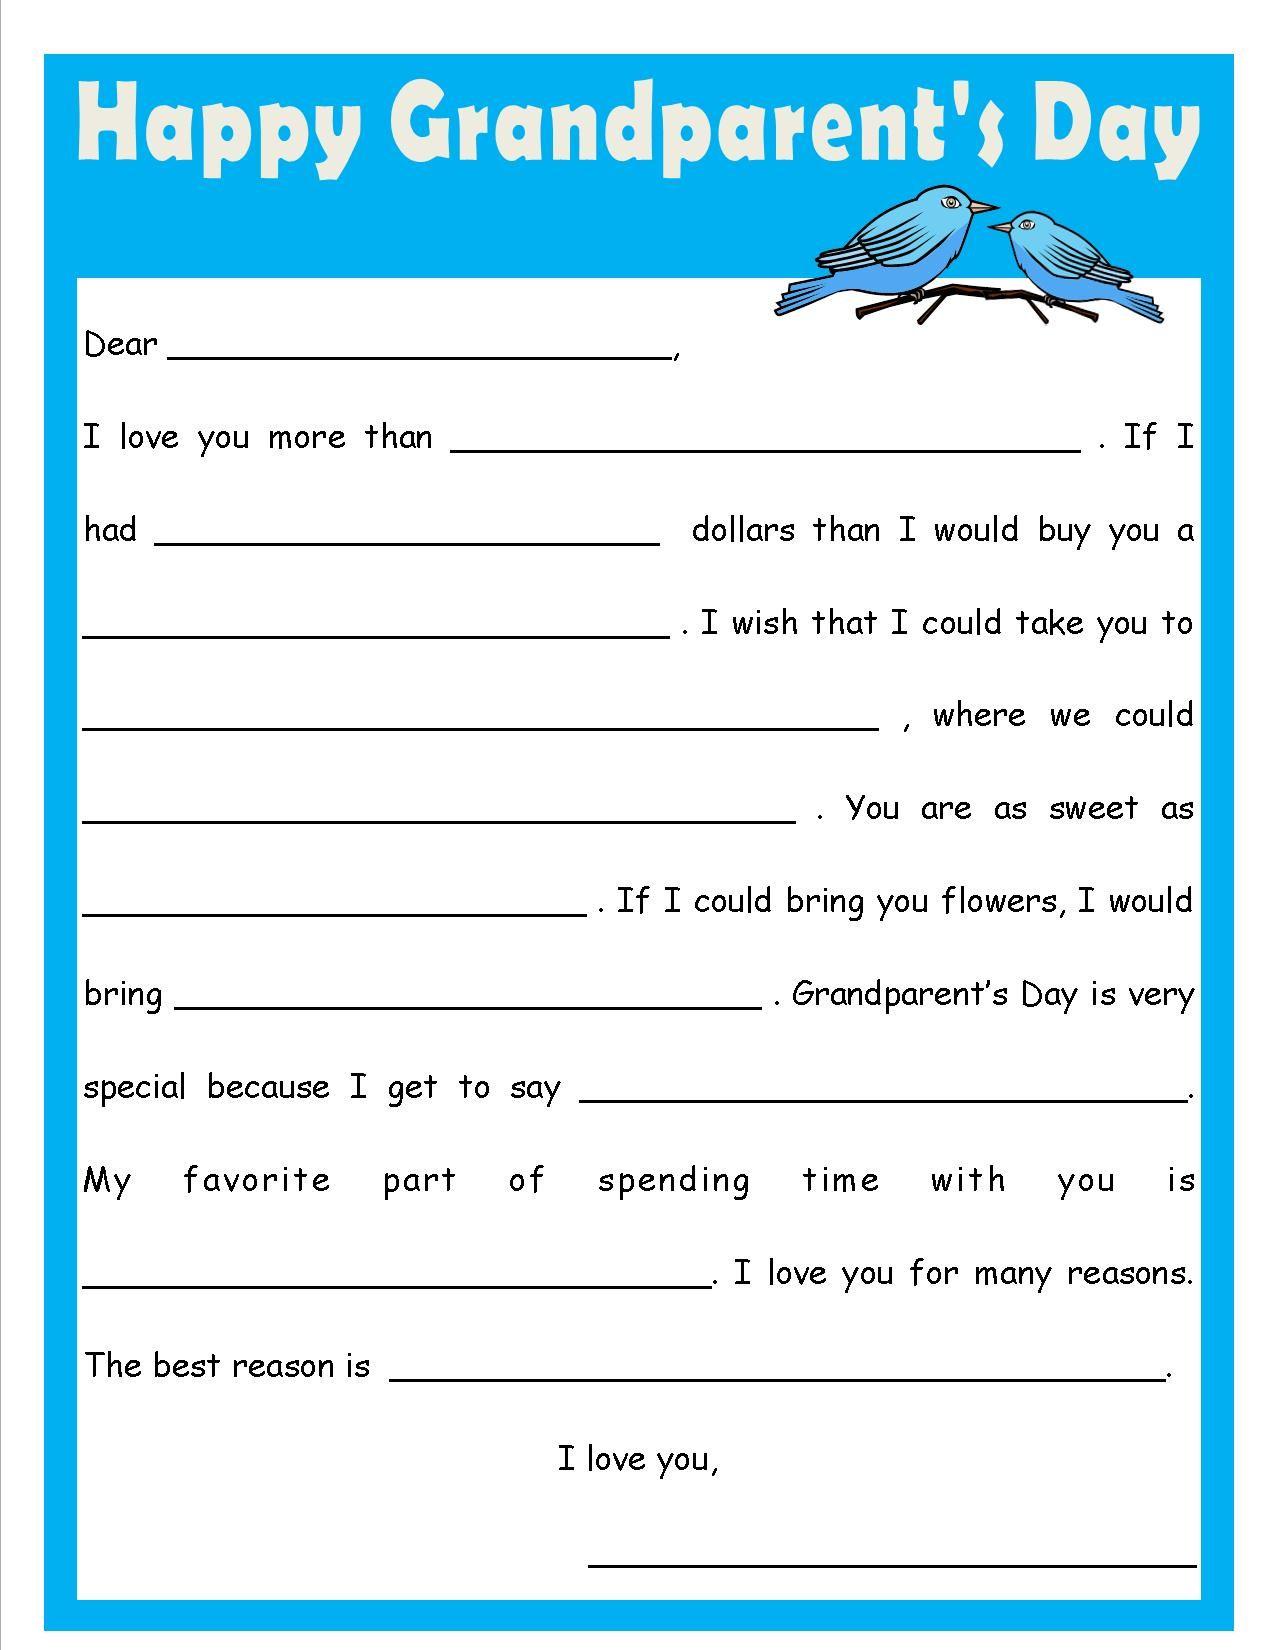 Grandparent S Day Fill In